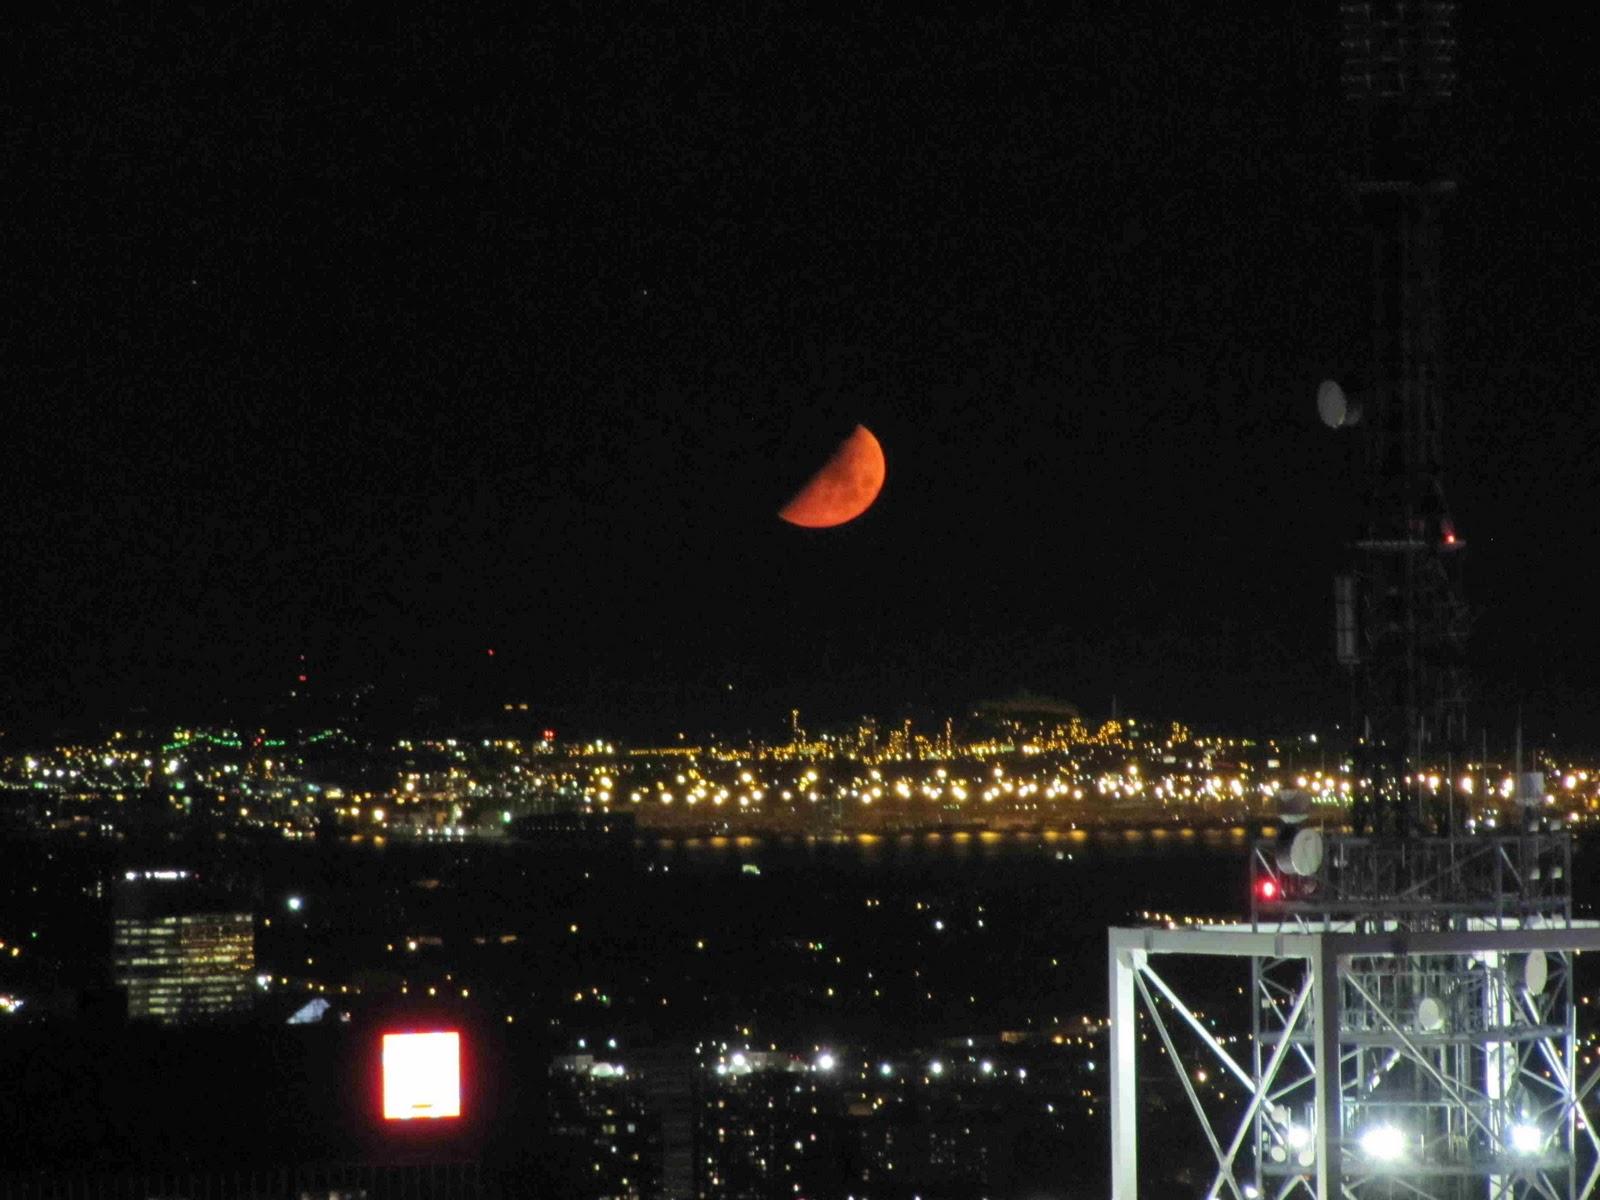 red moon nyc - photo #15